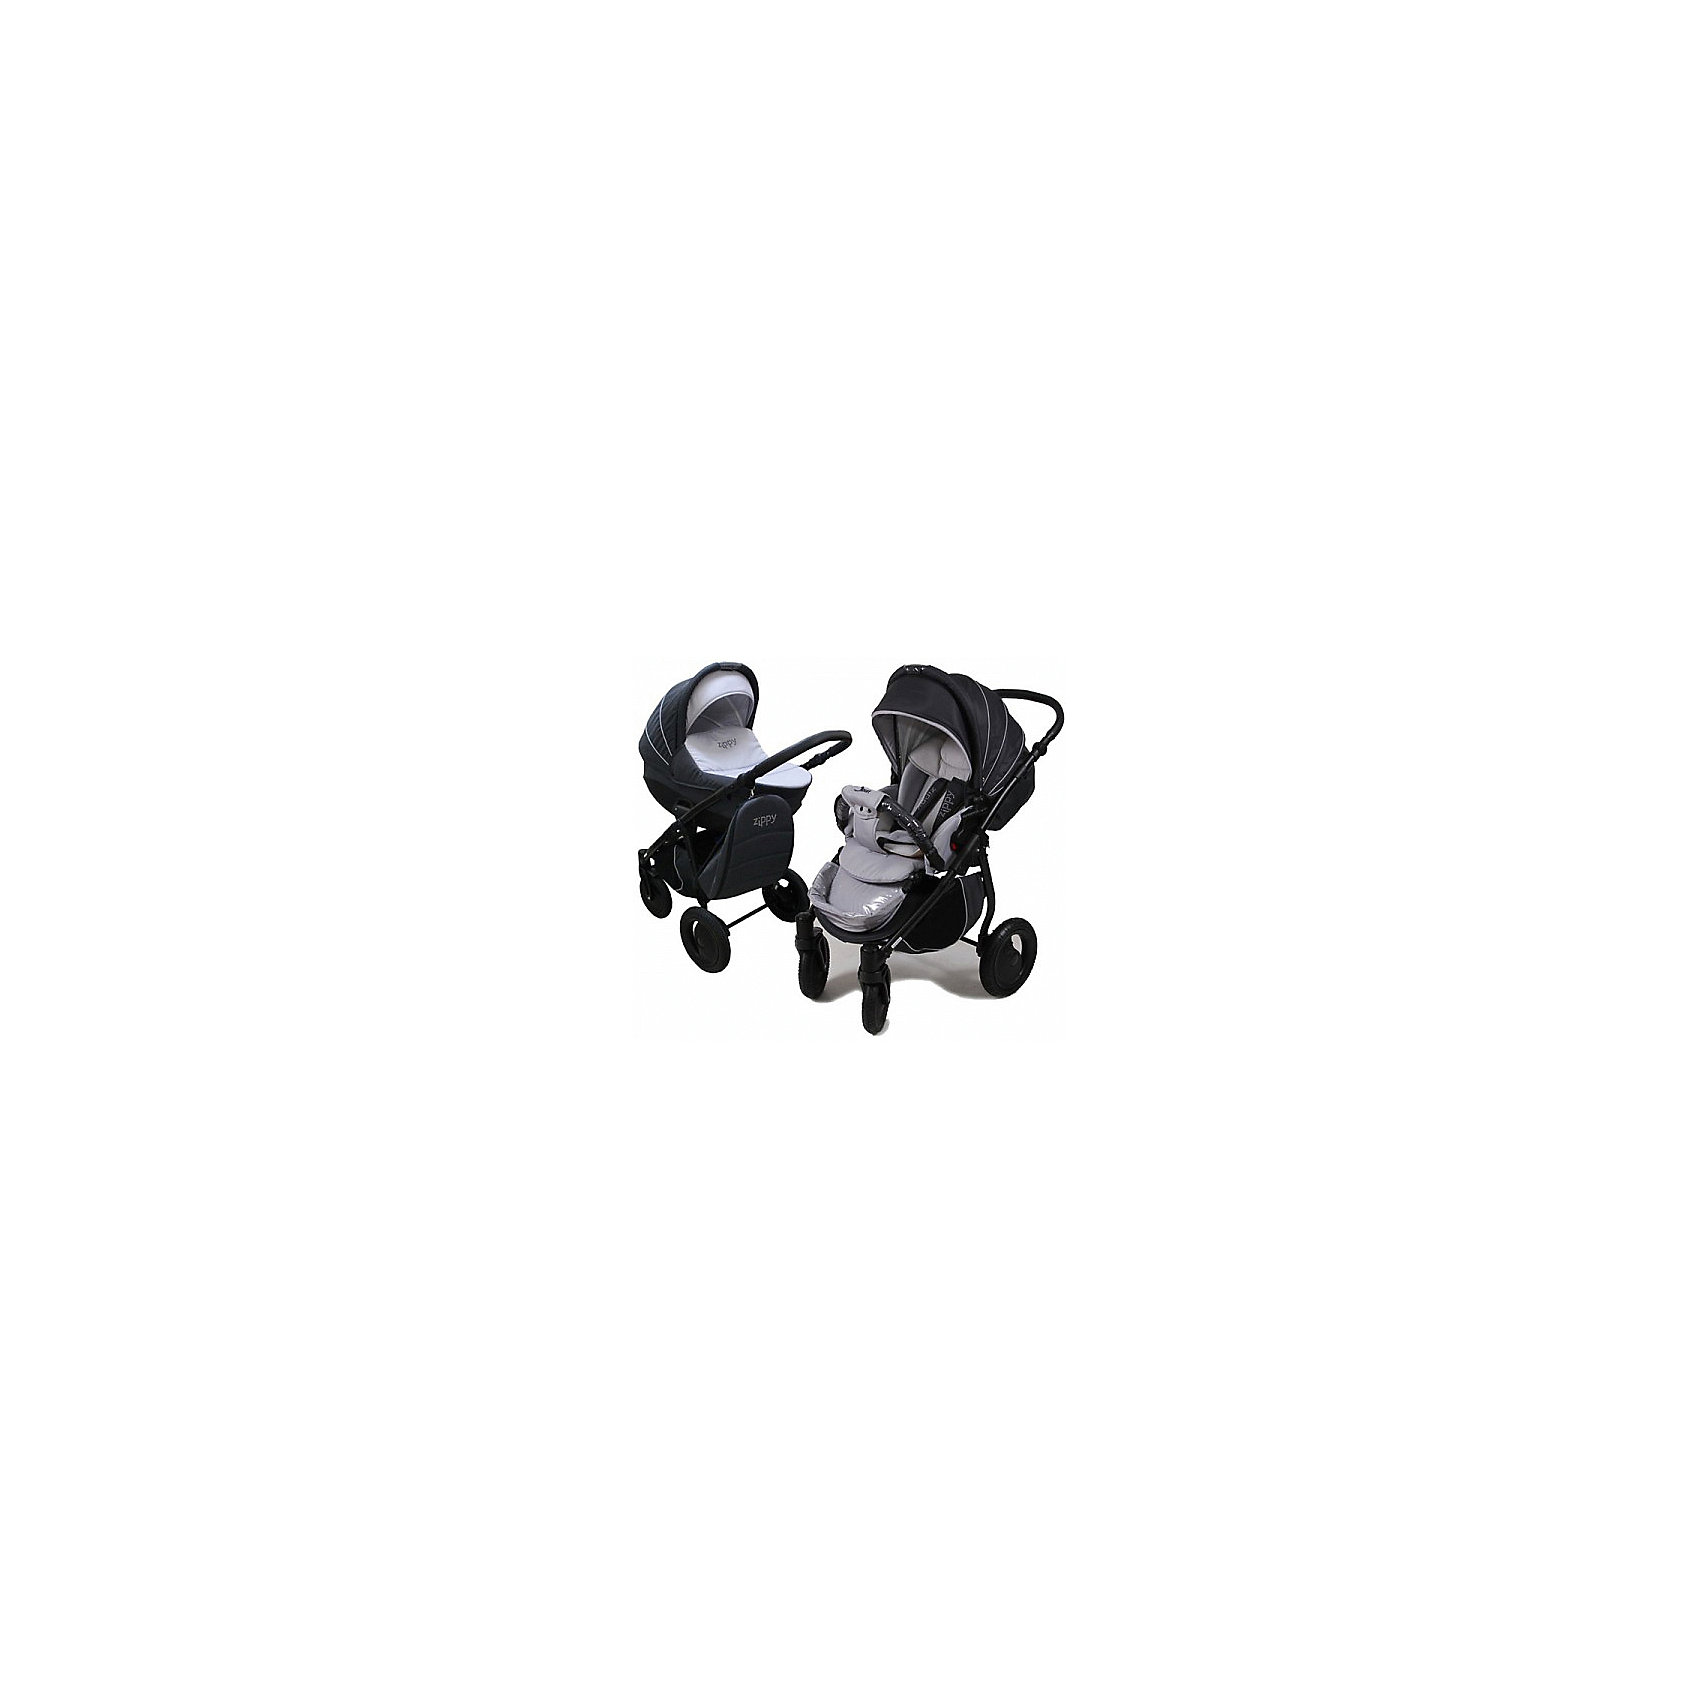 TUTIS Коляска 2 в 1 Zippy Sport Plus, Tutis, темно-серый/светло-серый